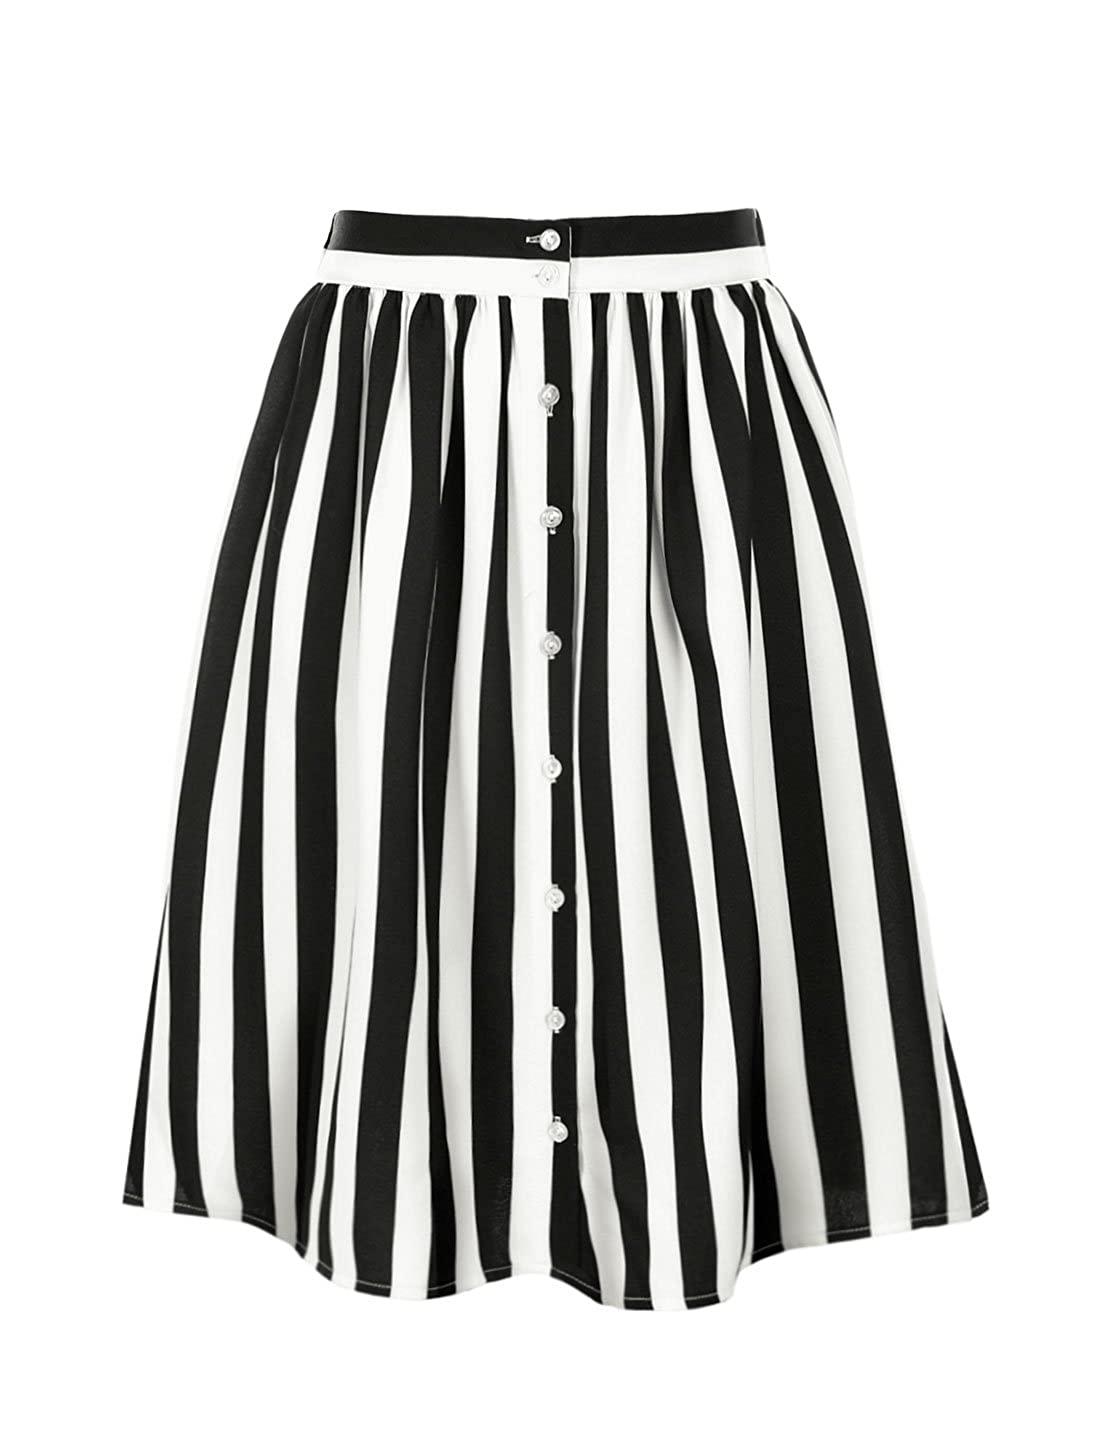 Saloon Girl Costume | Victorian Burlesque Dresses & History Allegra K Womens Striped Button Front Elastic Back Waist A Line Midi Skirt $24.99 AT vintagedancer.com